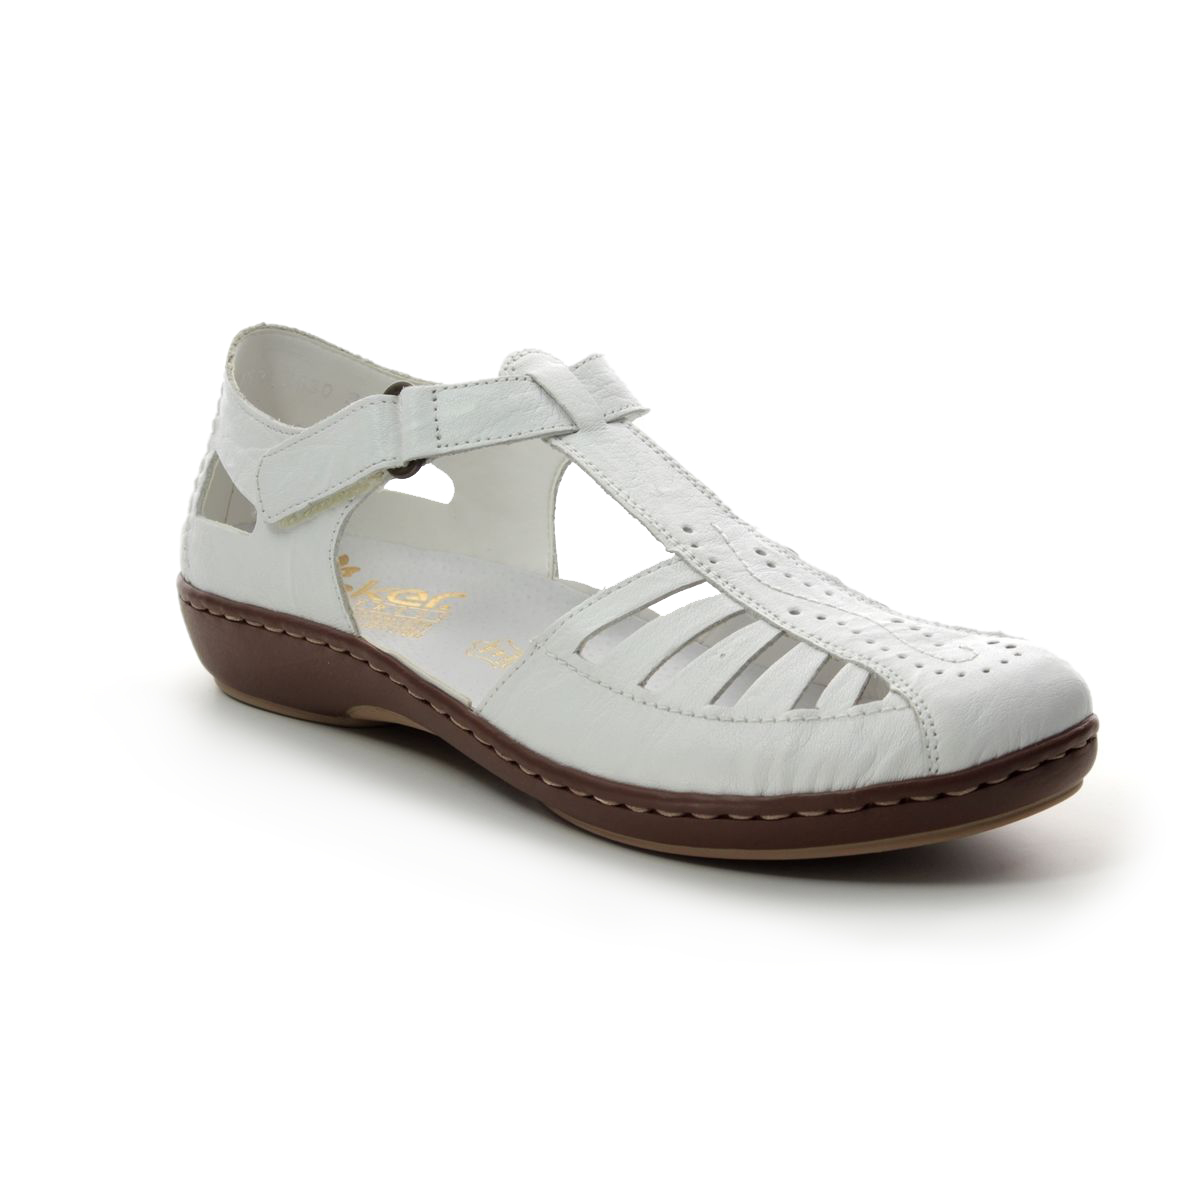 Rieker 45865-80 White Closed Toe Sandals